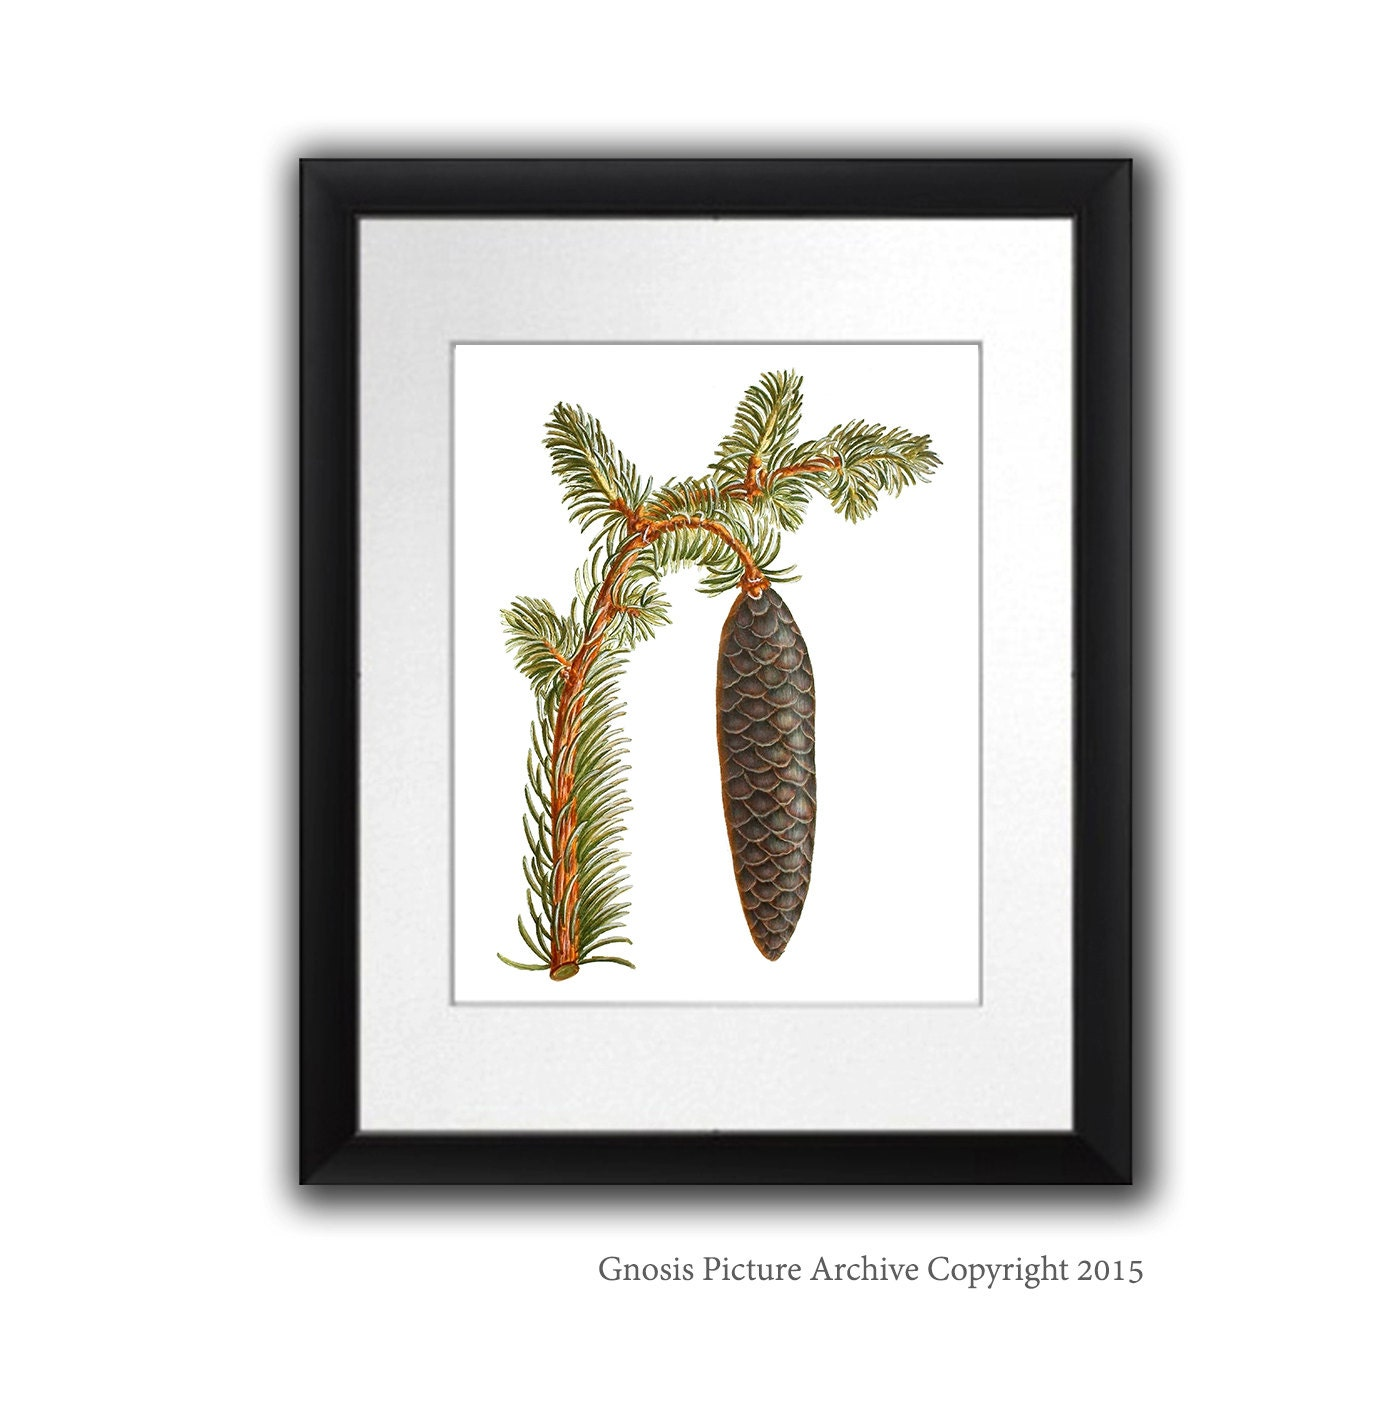 Antique Botanical Art Wall Hanging Conifers Print 12 Pinecone